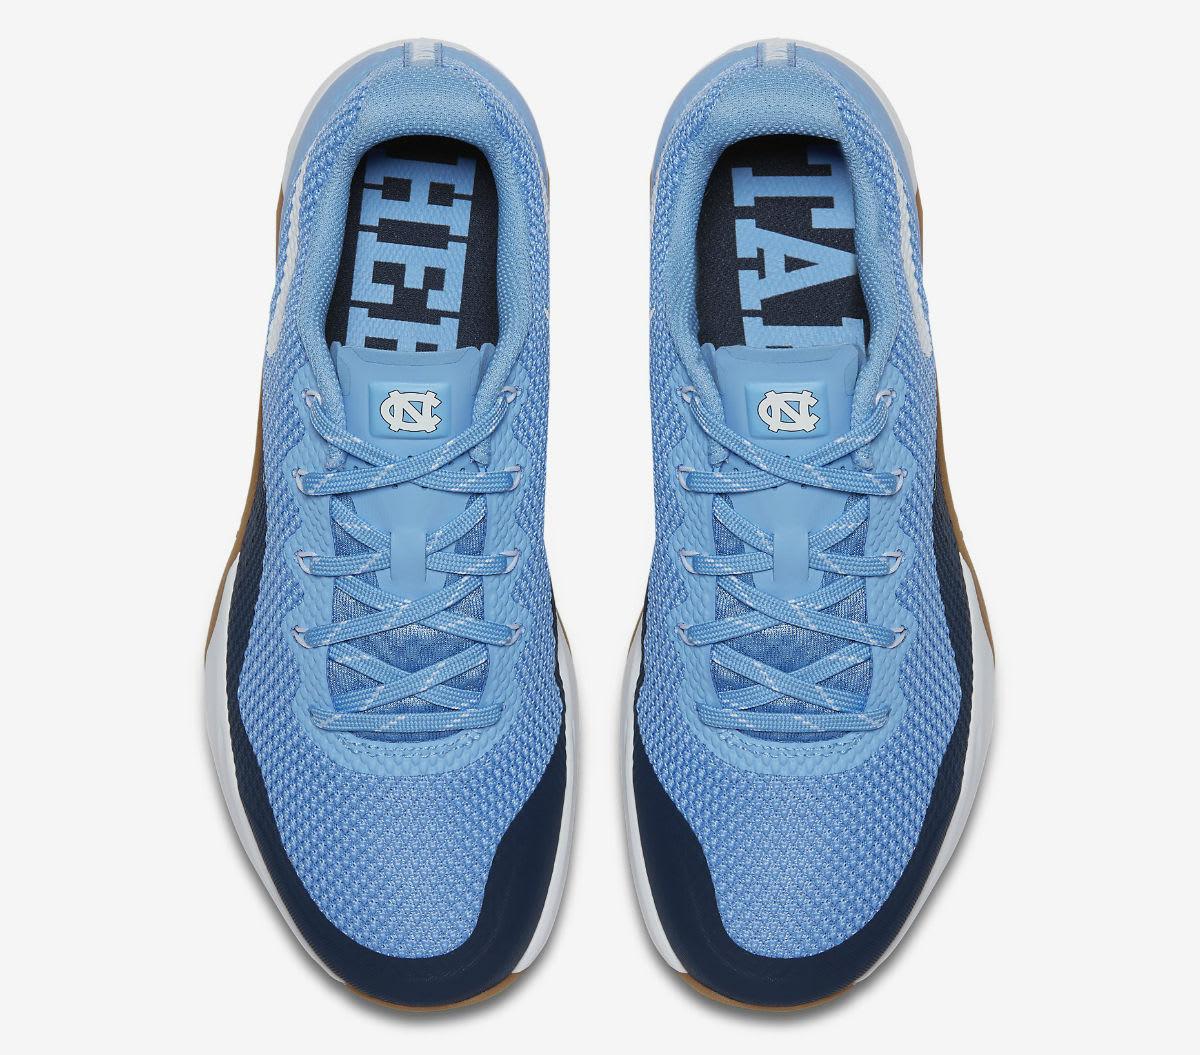 Nike Metcon Repper DSX UNC Release Date (2)